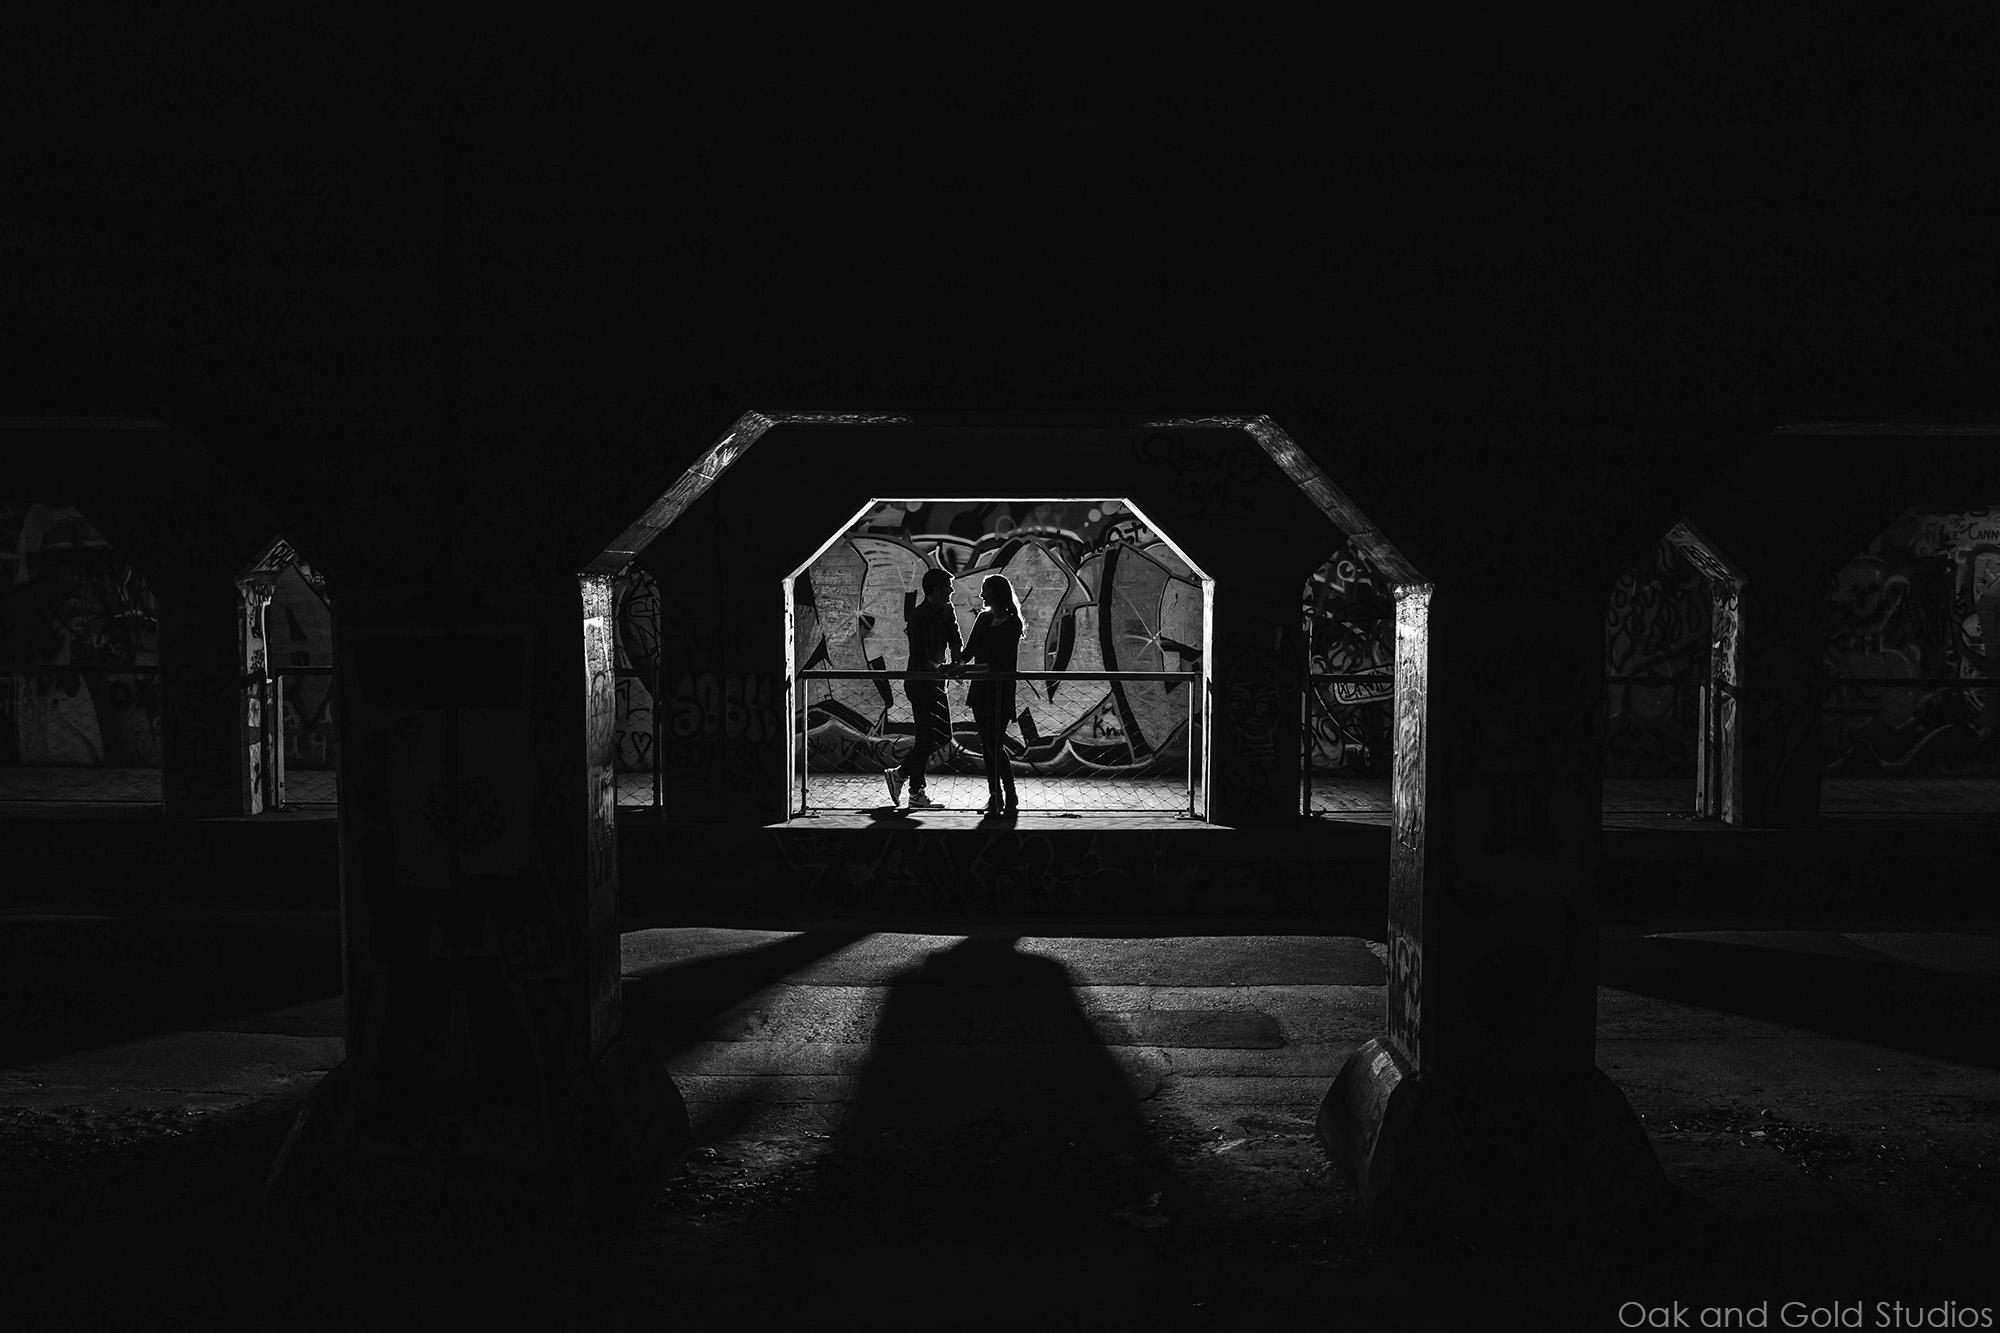 krog st tunnel photos.jpg